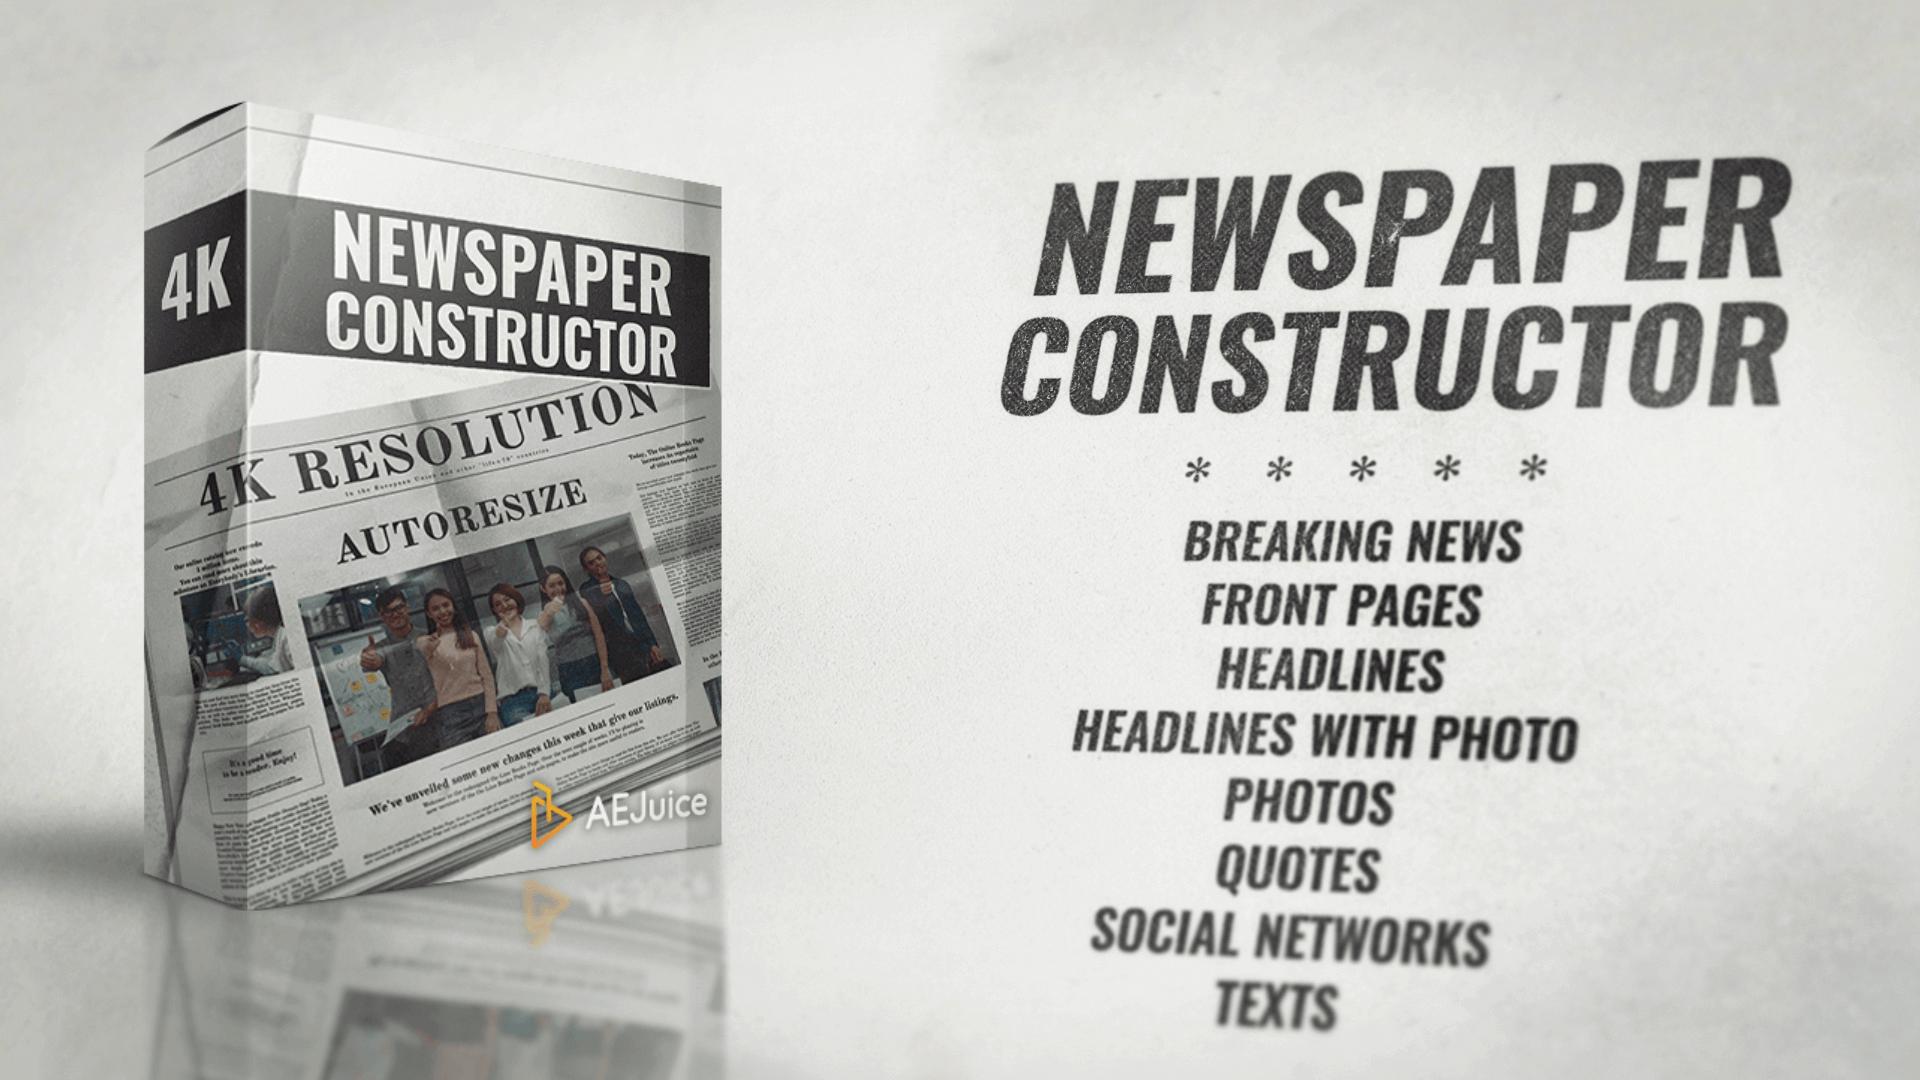 Newspaper Constructor